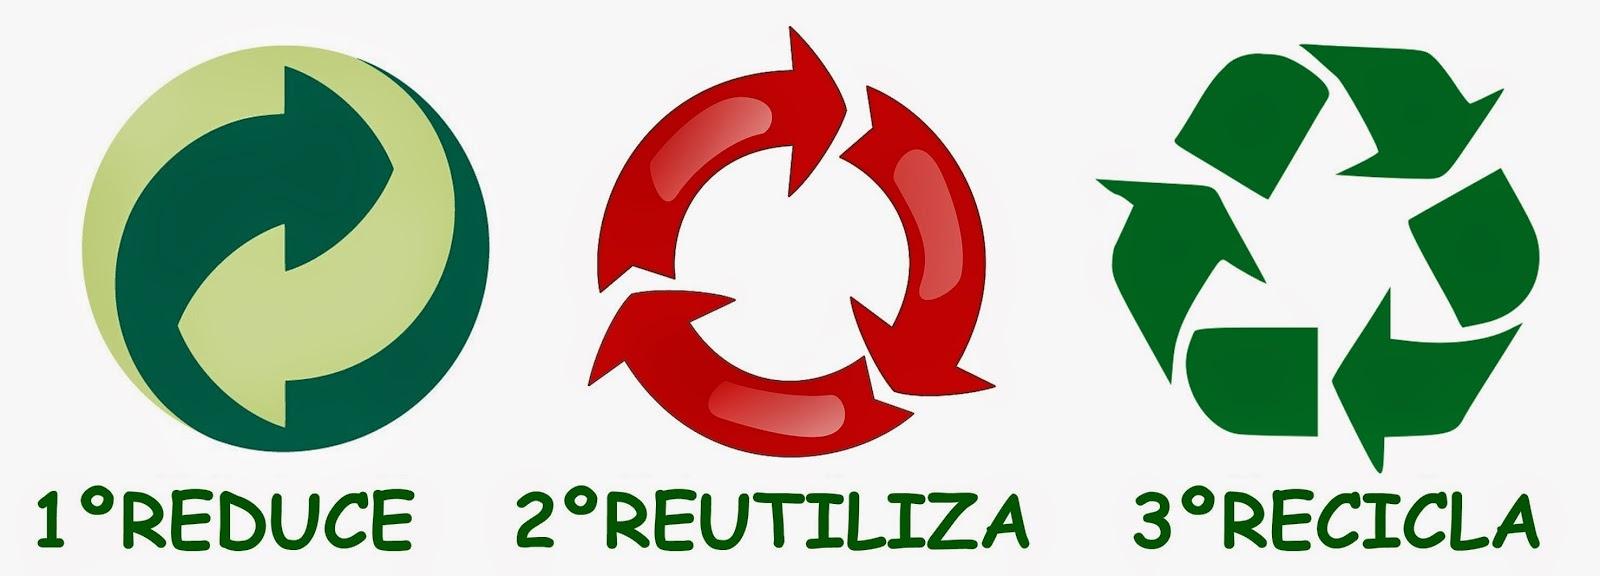 Reutilizar | www.imgkid.com - The Image Kid Has It!